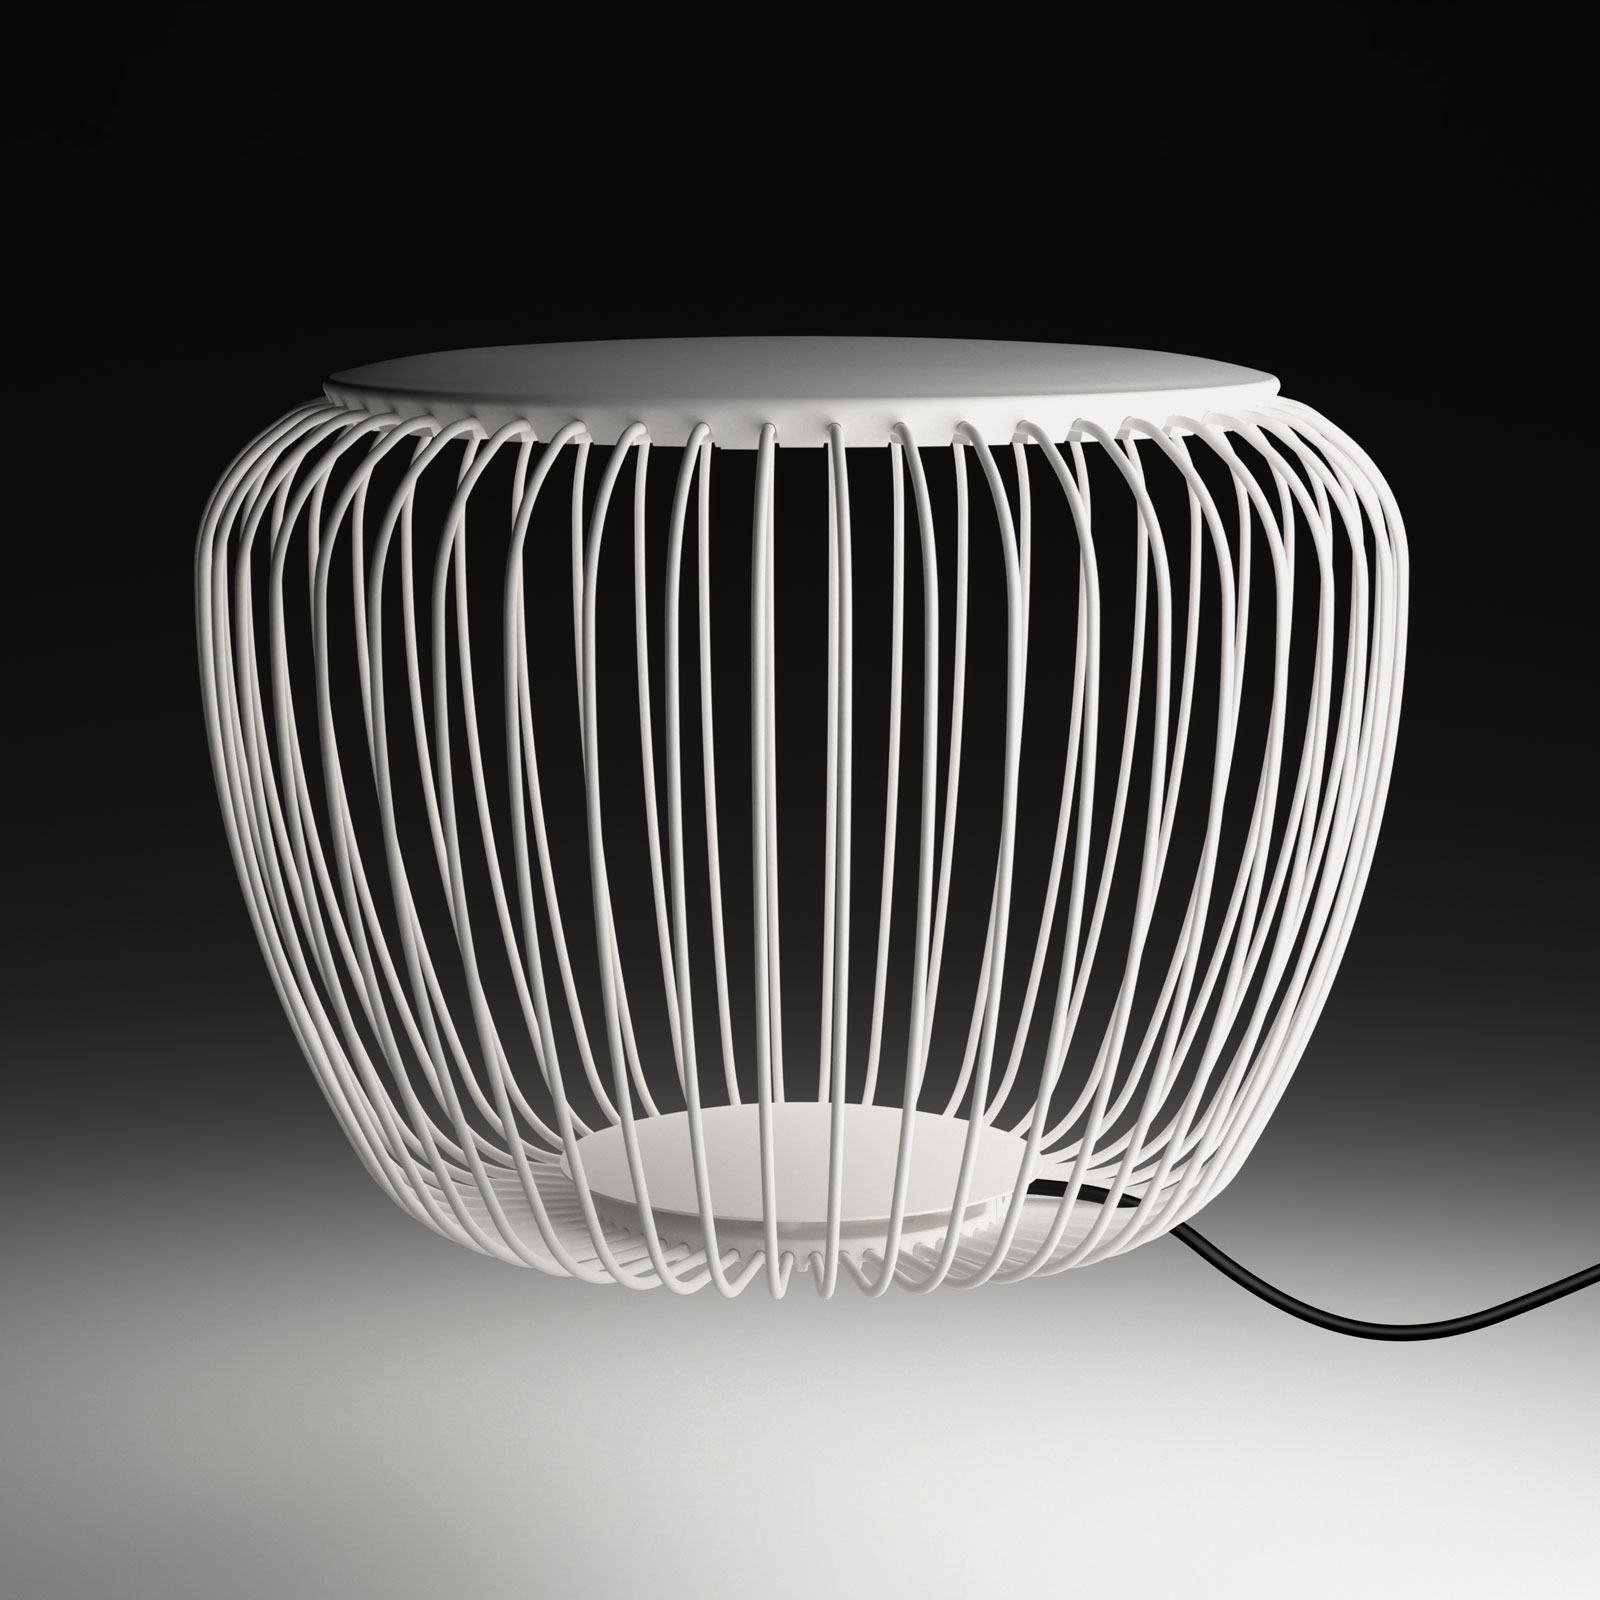 Vibia Meridiano 4710 lampe ext., Ø 64cm, crème